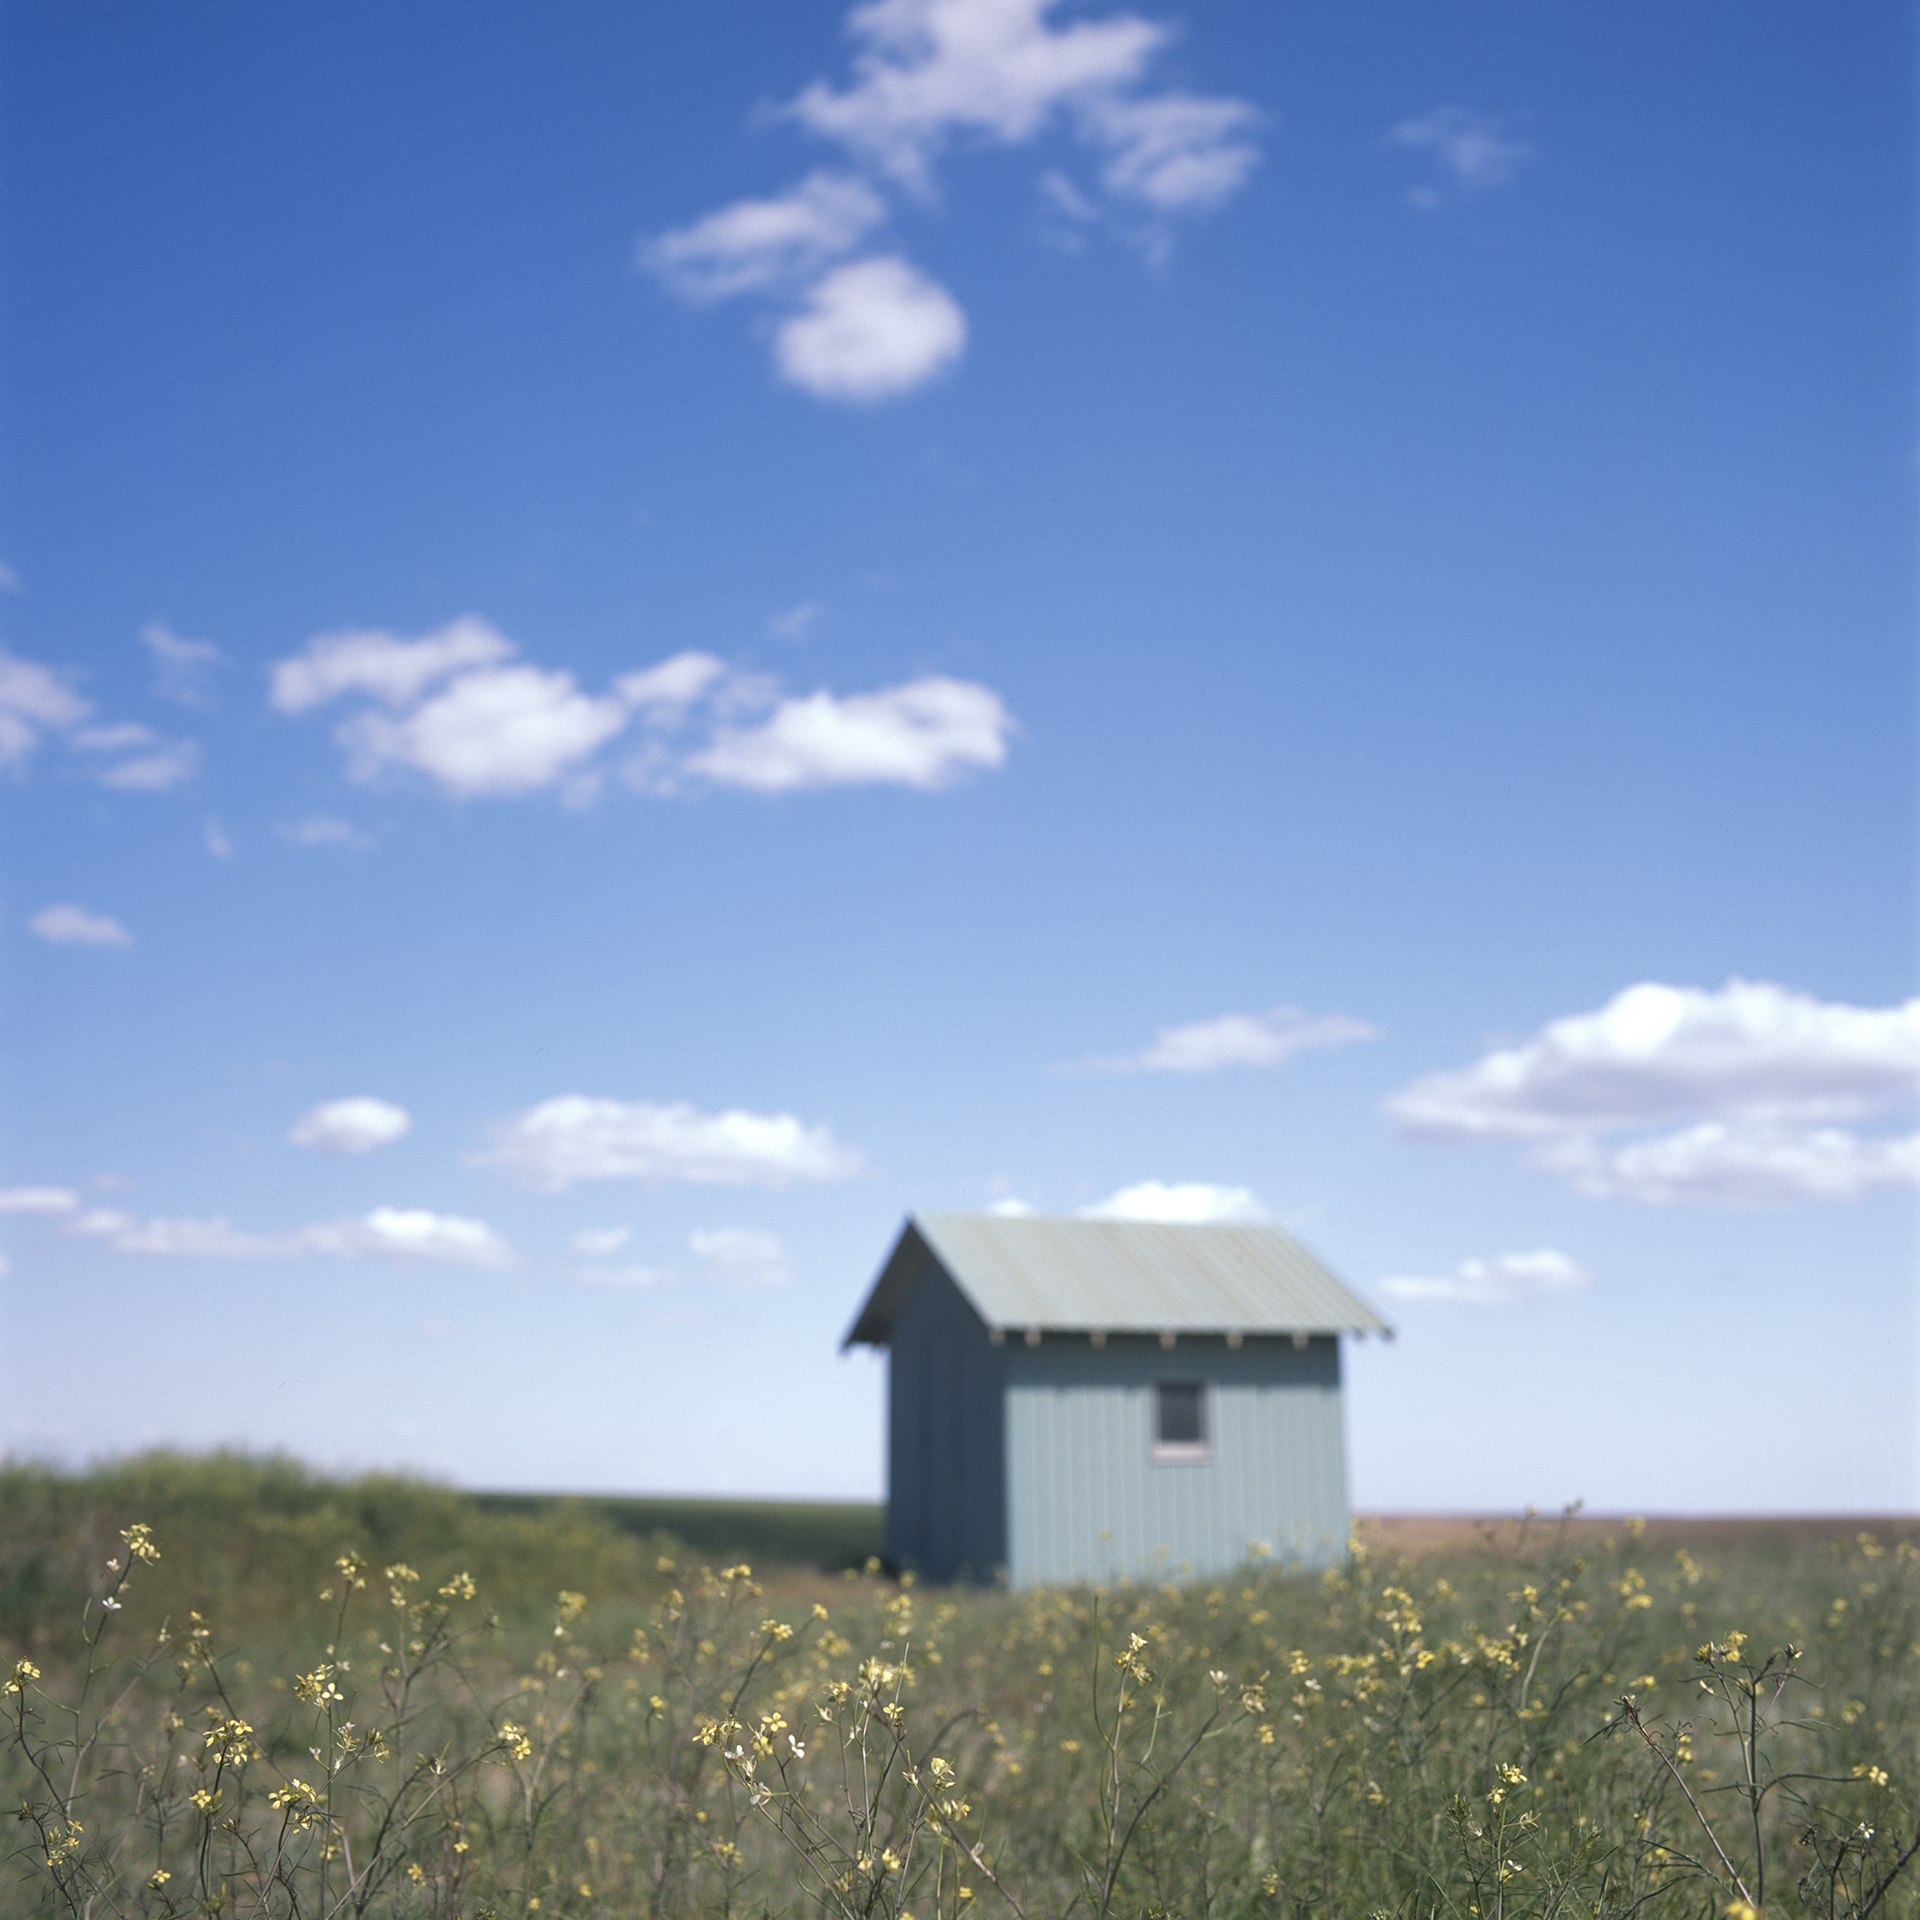 Prairie Shed, 2008